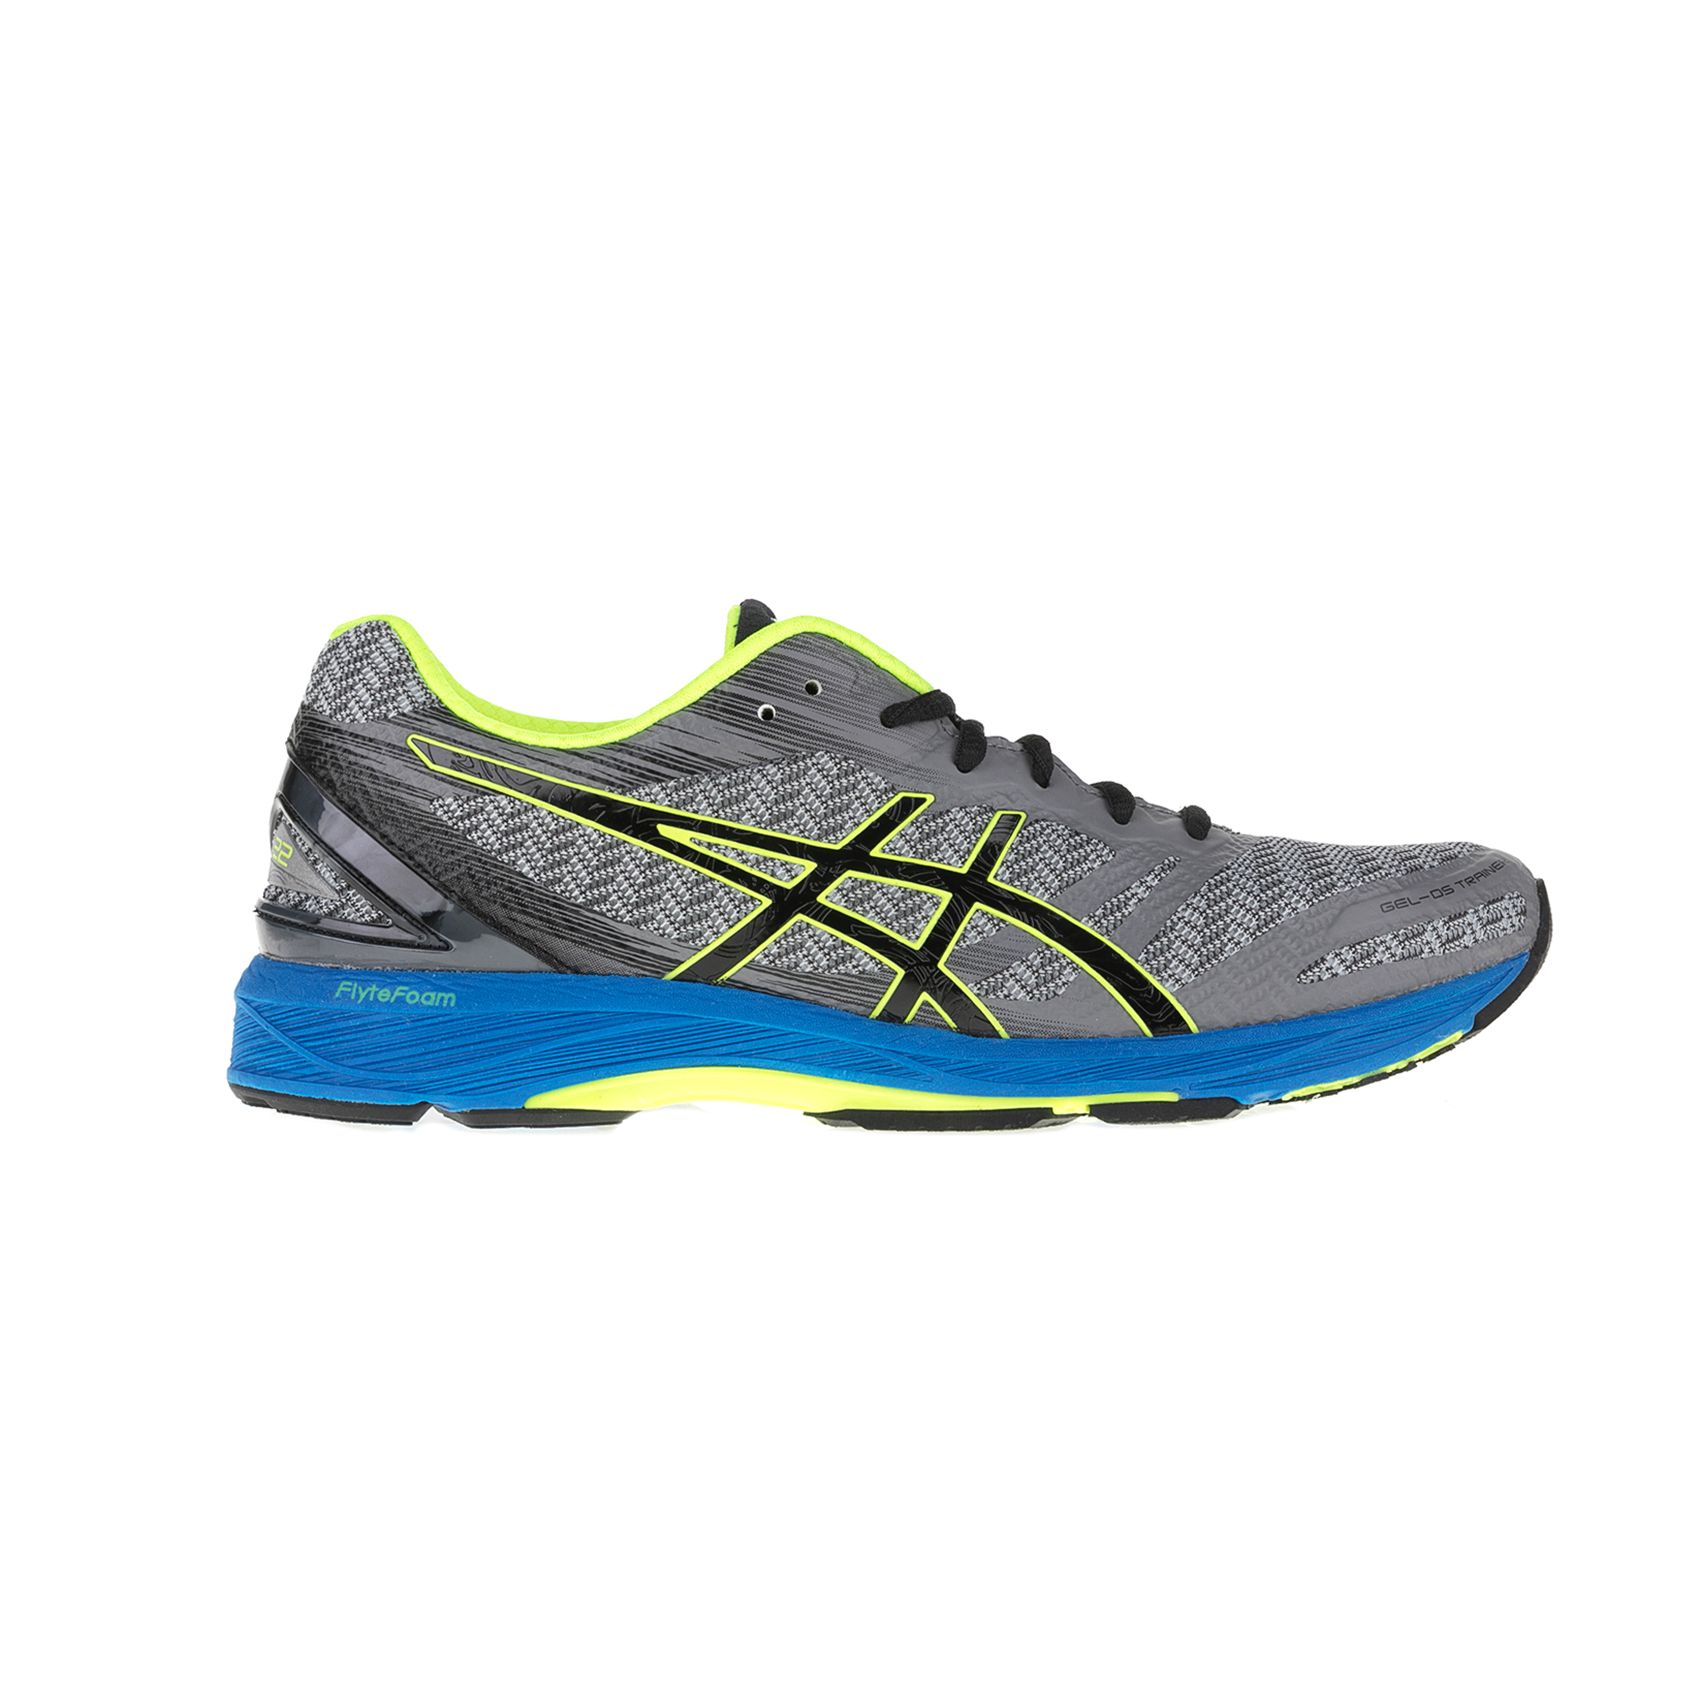 ASICS - T720N-9790 GEL-DS TRAINER 22 ΥΠΟΔΗΜΑ ανδρικά παπούτσια αθλητικά running